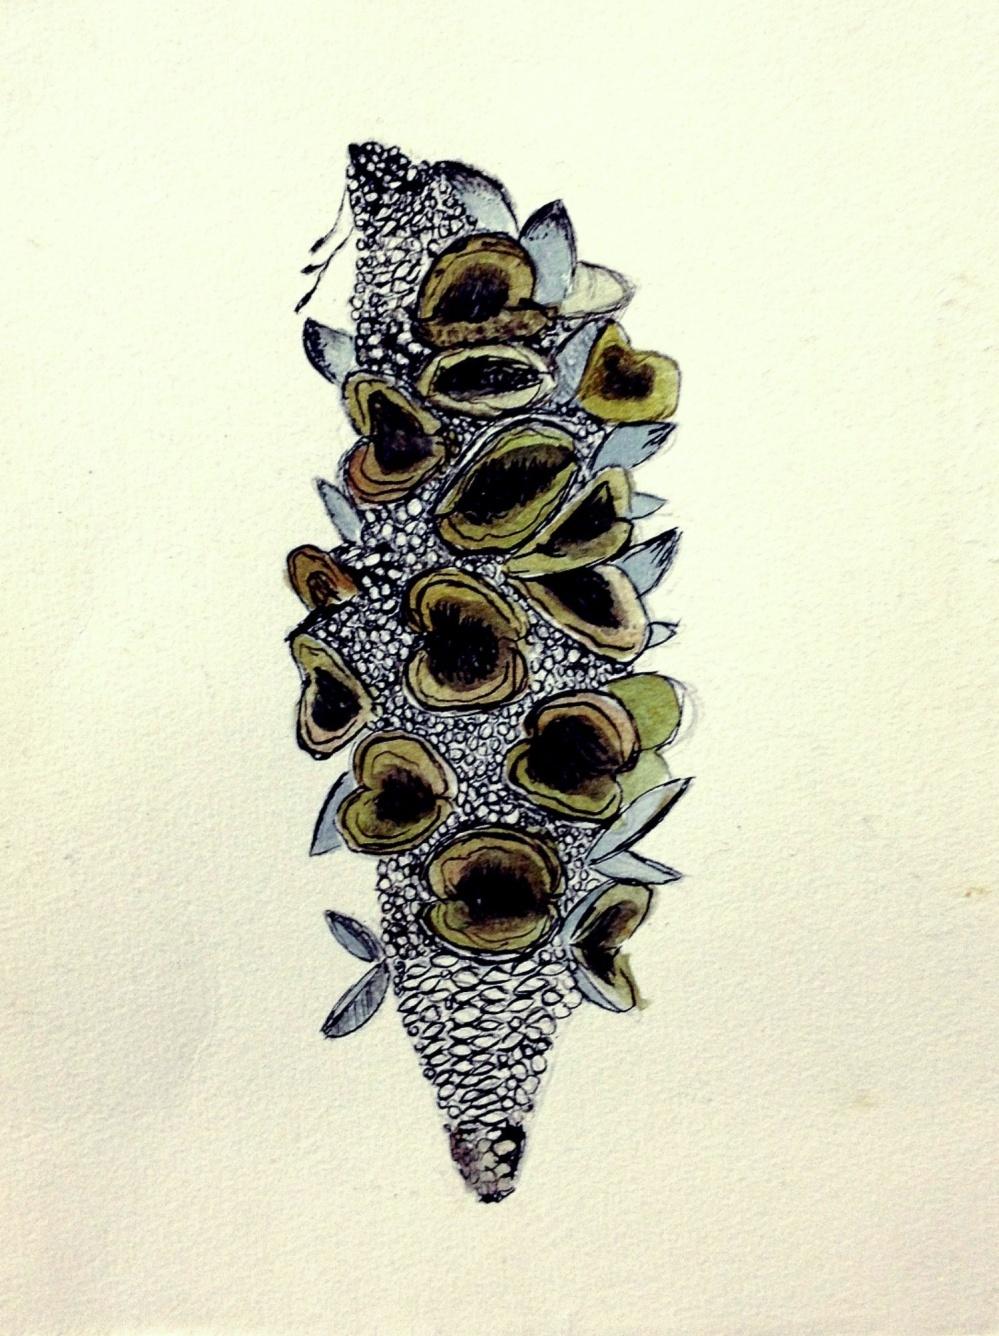 Banksia seed pod illustration.